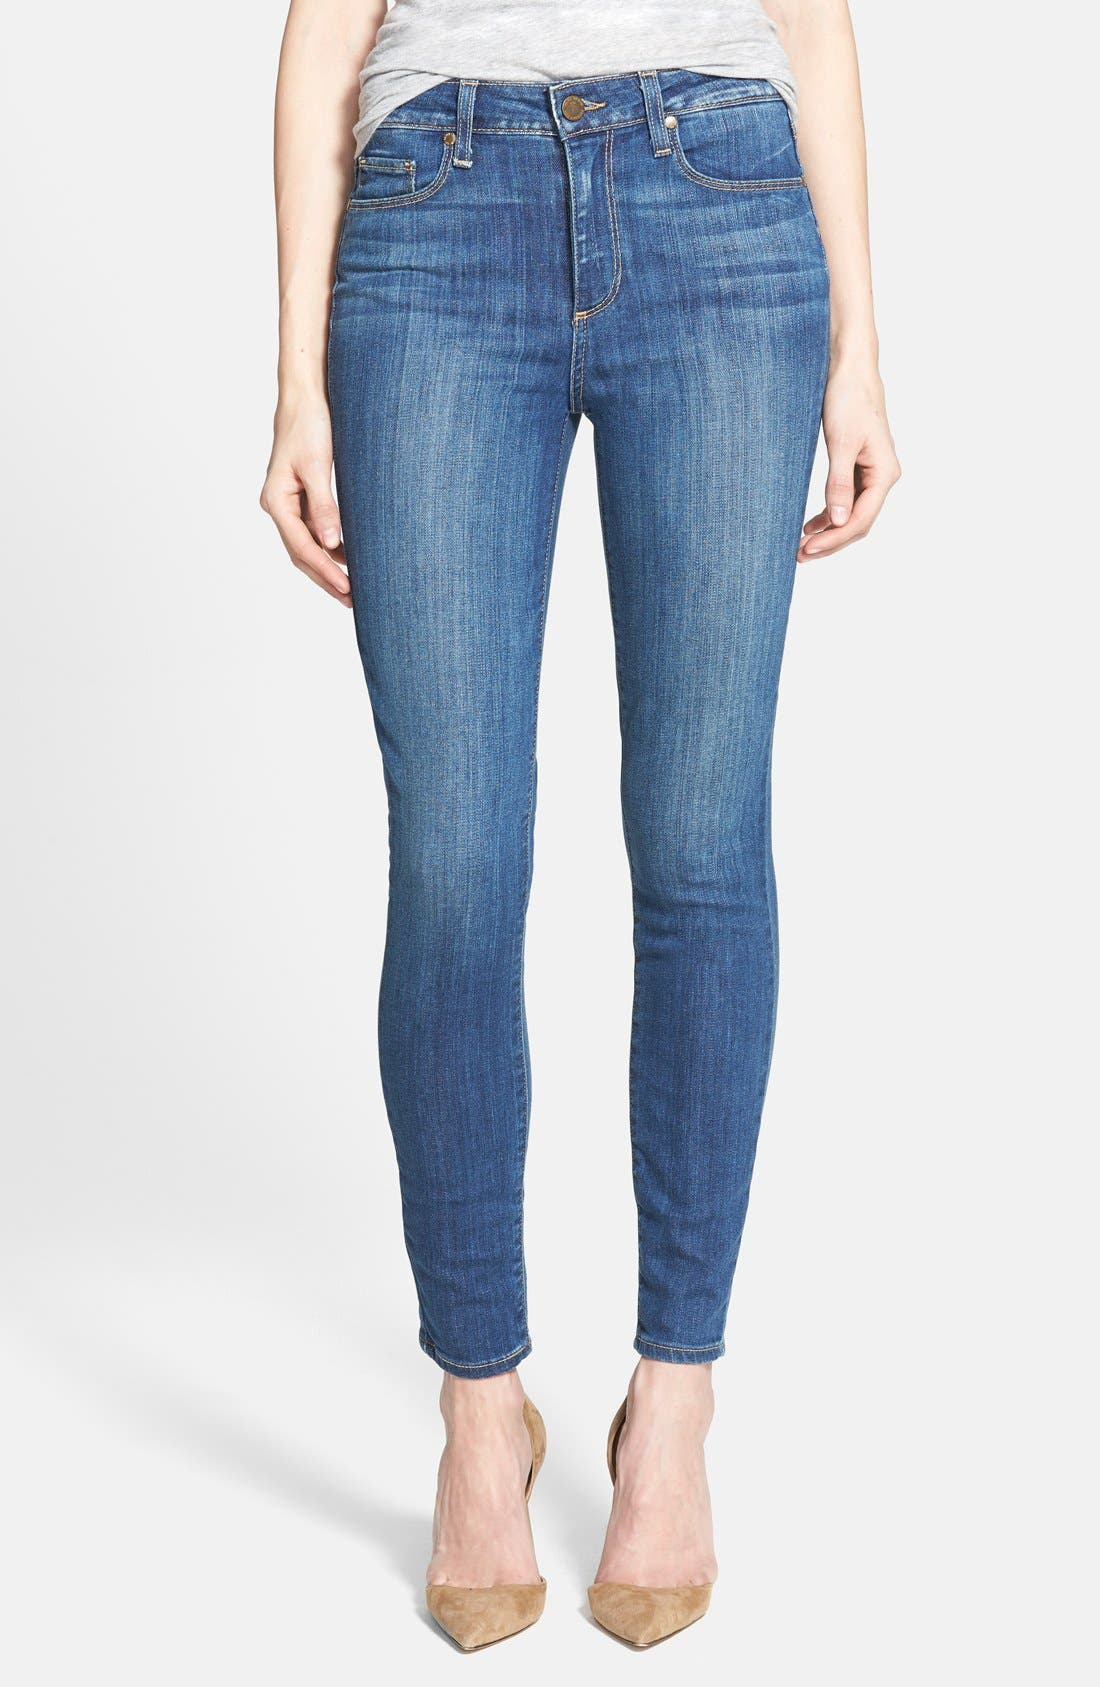 Alternate Image 1 Selected - Paige Denim 'Hoxton' Ankle Jeans (Orson Blue)